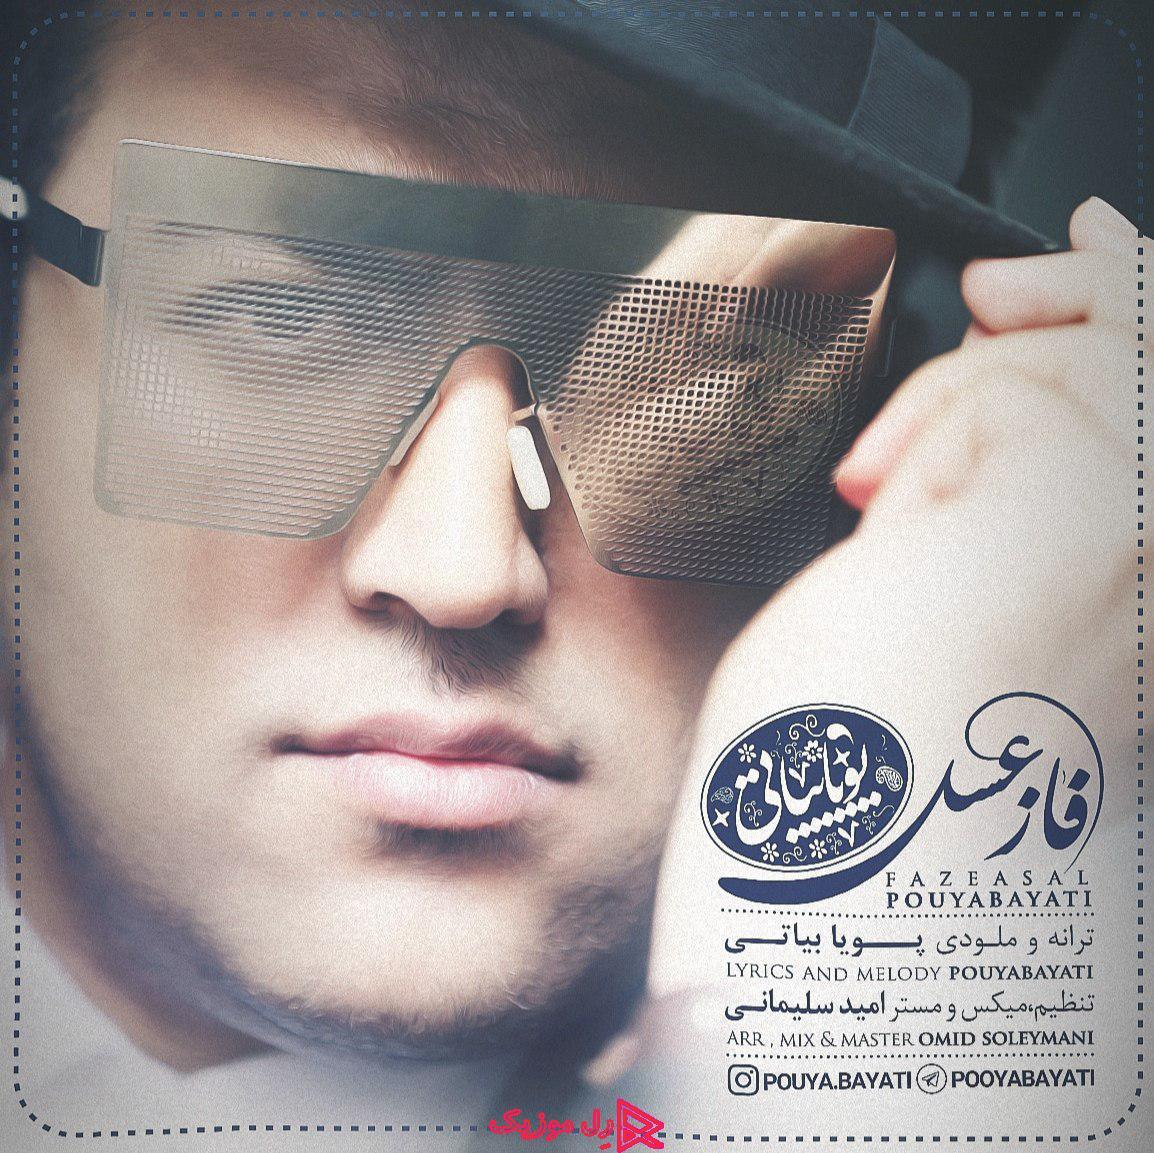 Pouya Bayati Faaze Asal RellMusic - دانلود آهنگ جدید پویا بیاتی به نام فاز عسل (همراه متن و ویدیو)